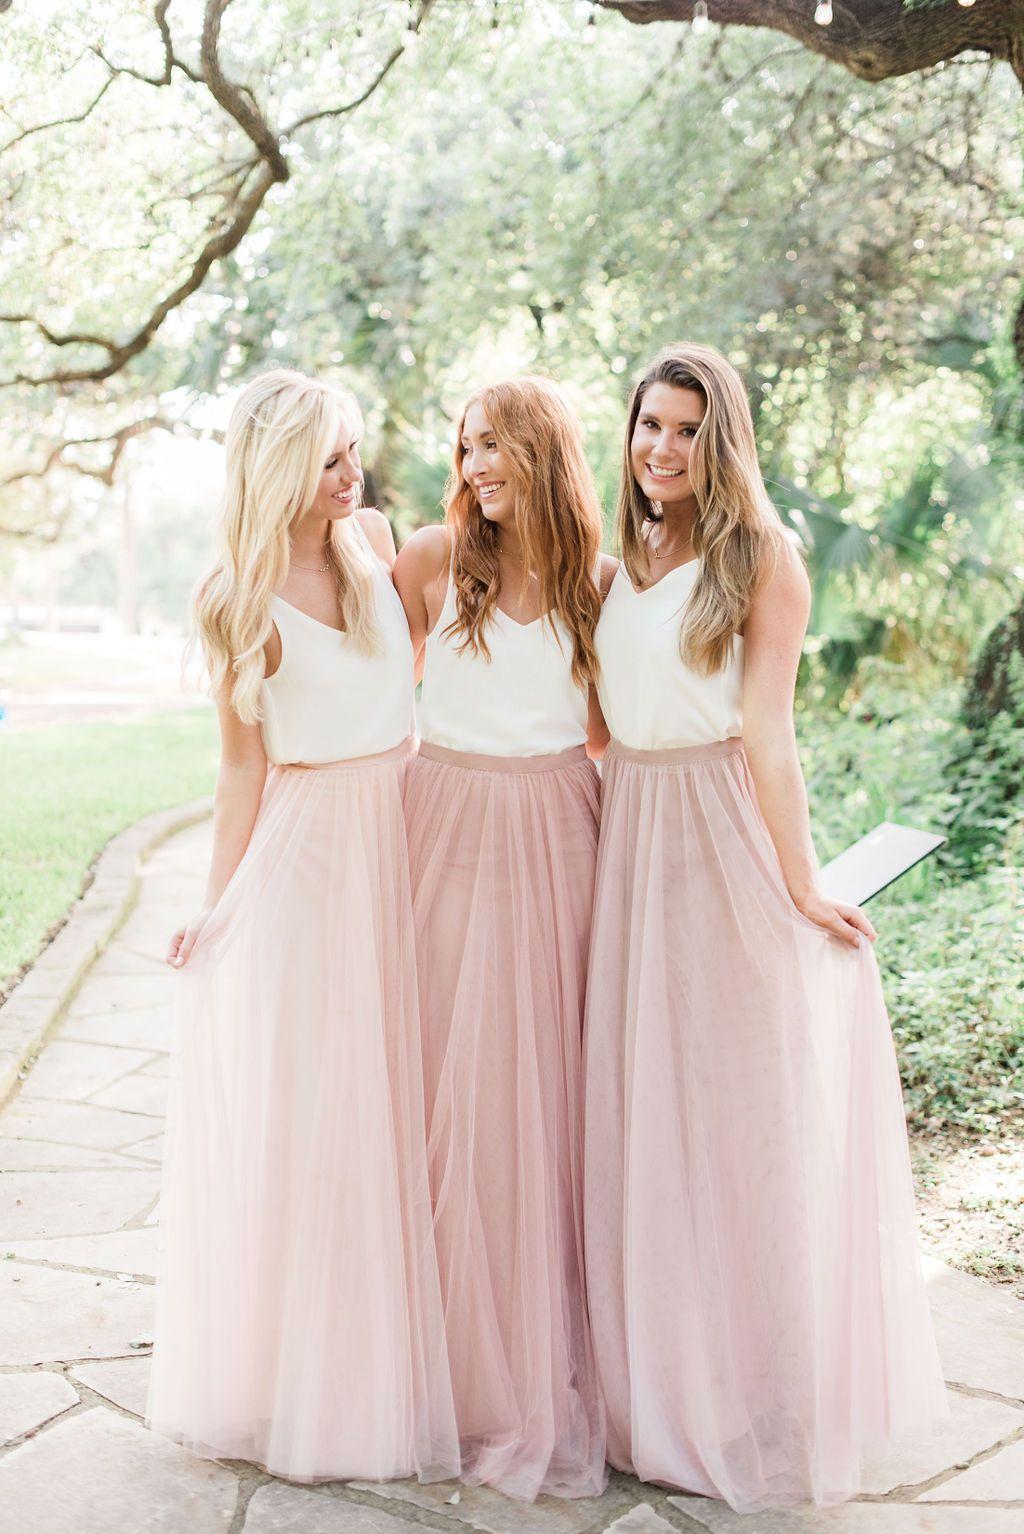 Heidi Chiffon Top Different Bridesmaid Dresses Casual Bridesmaid Dresses Unique Bridesmaid Dresses